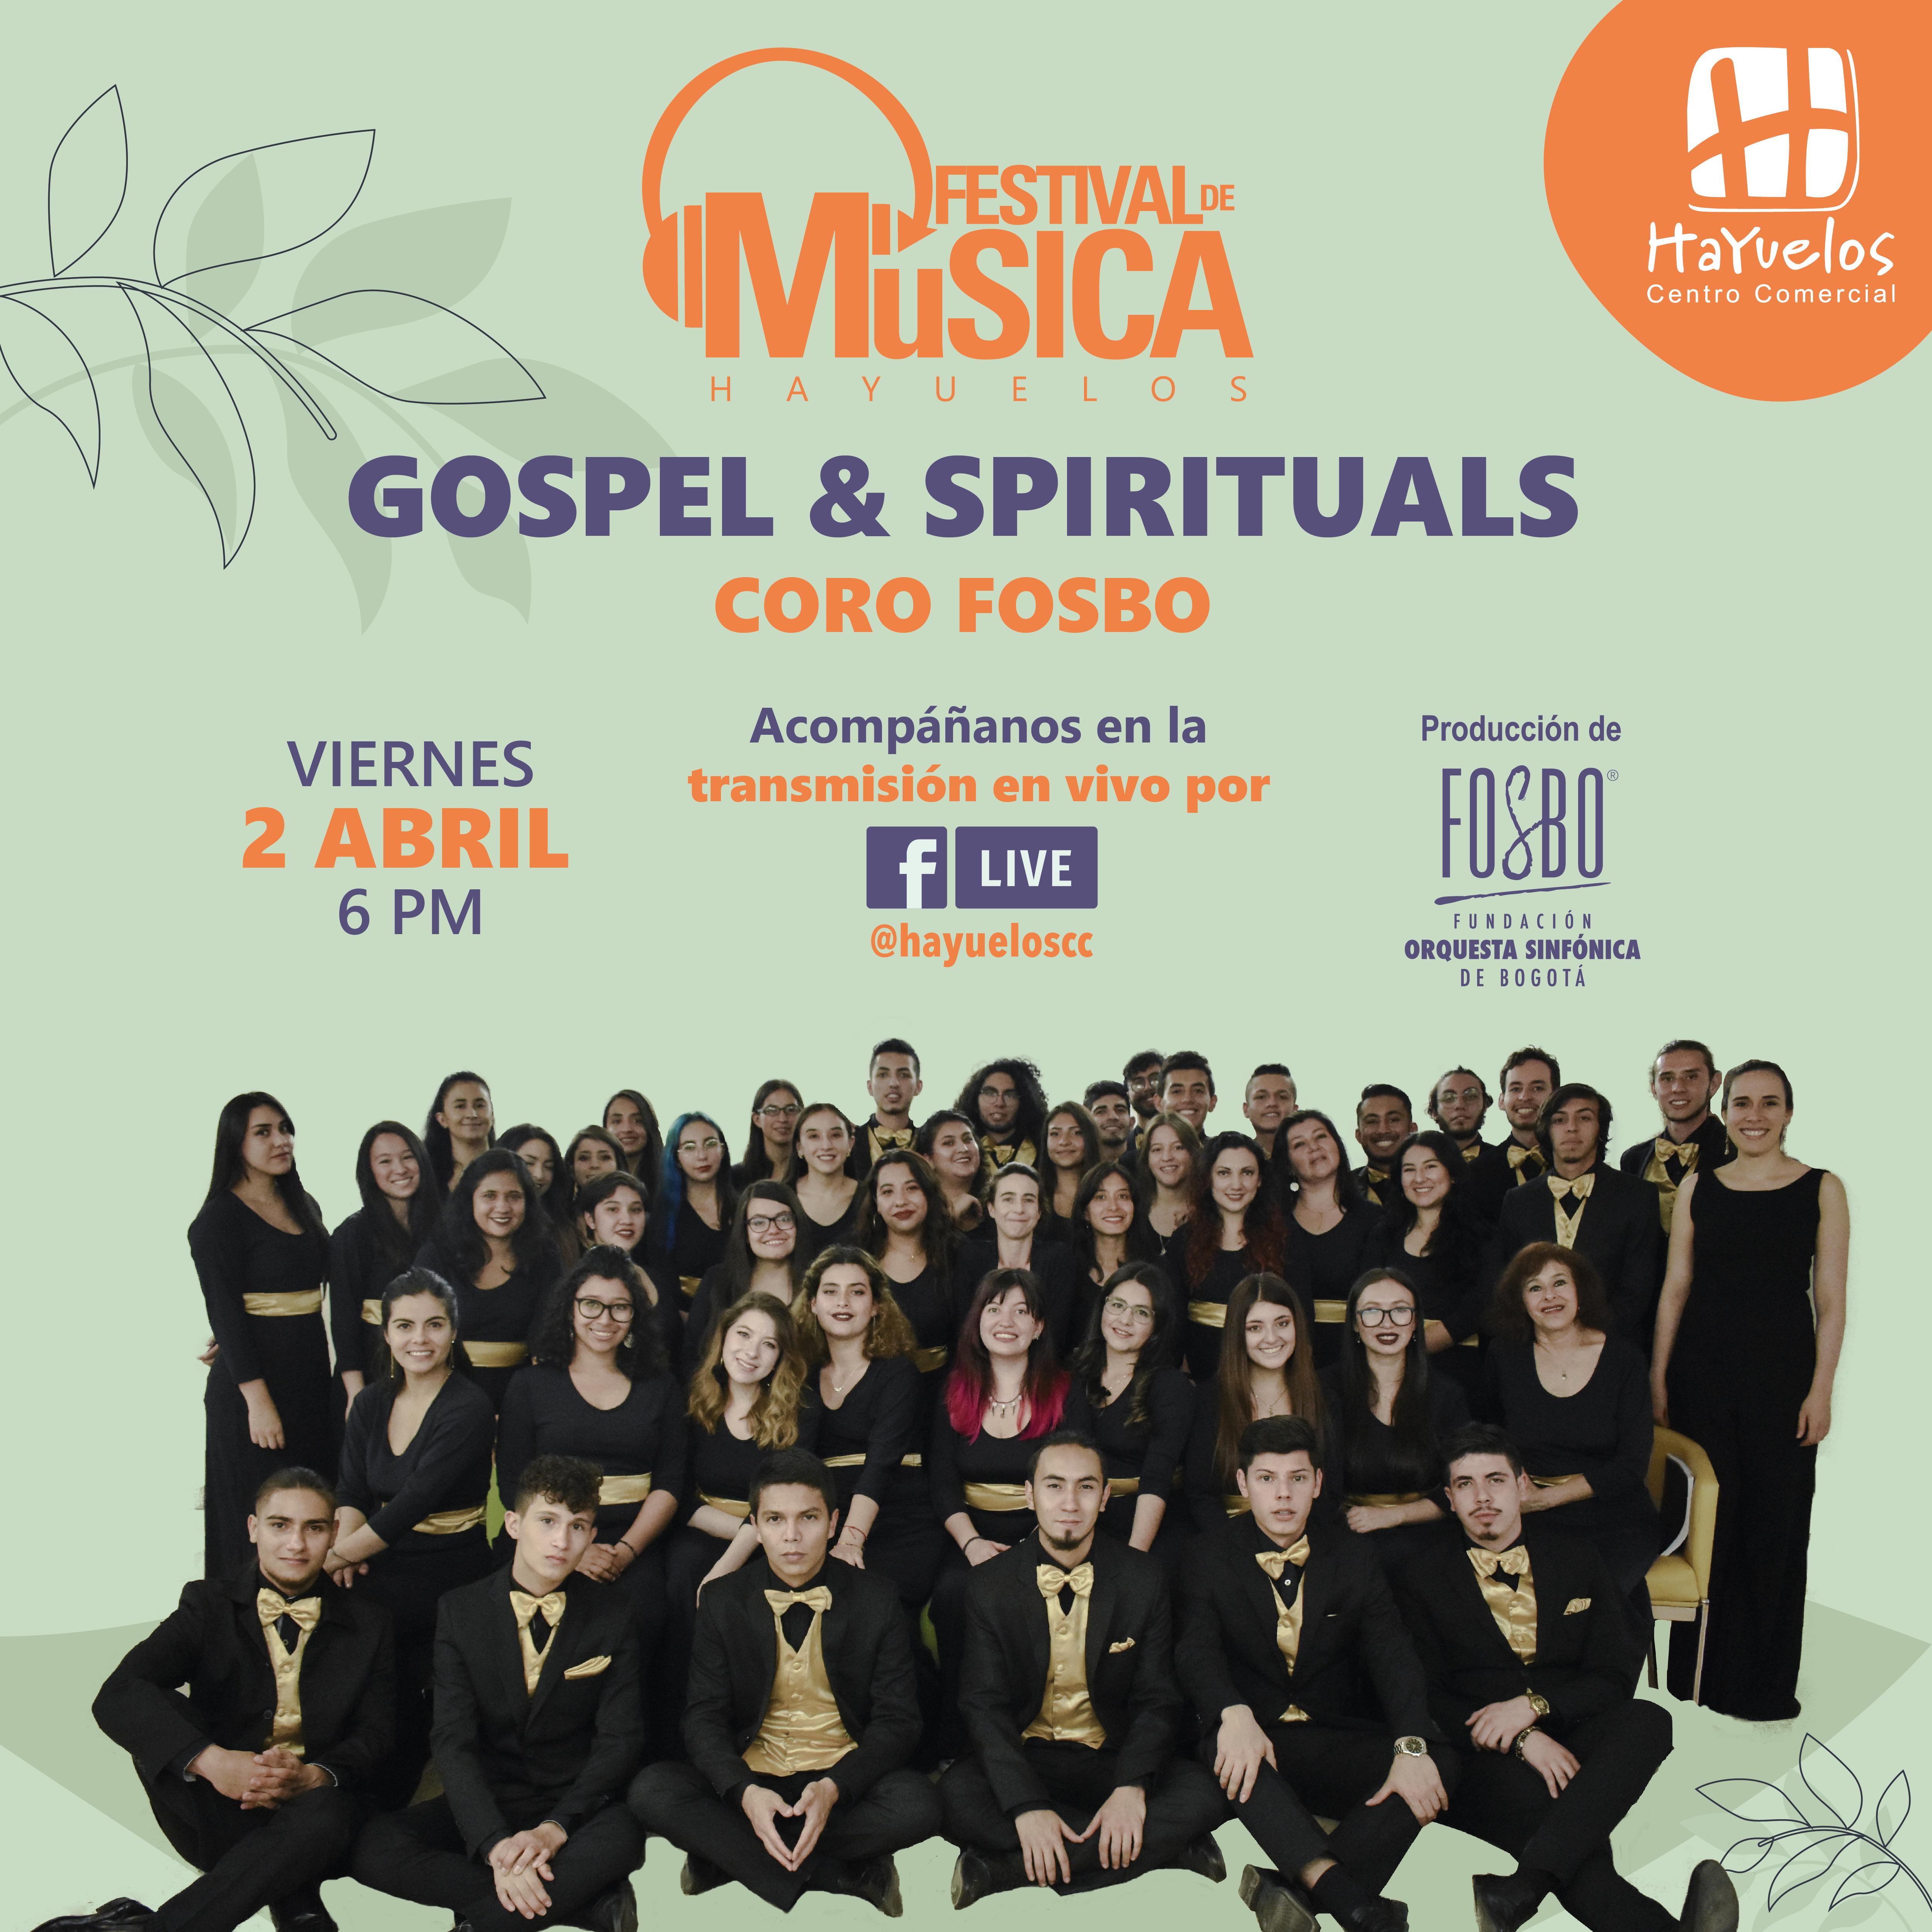 Coro Fosbo Festival de Música Hayuelos Góspel